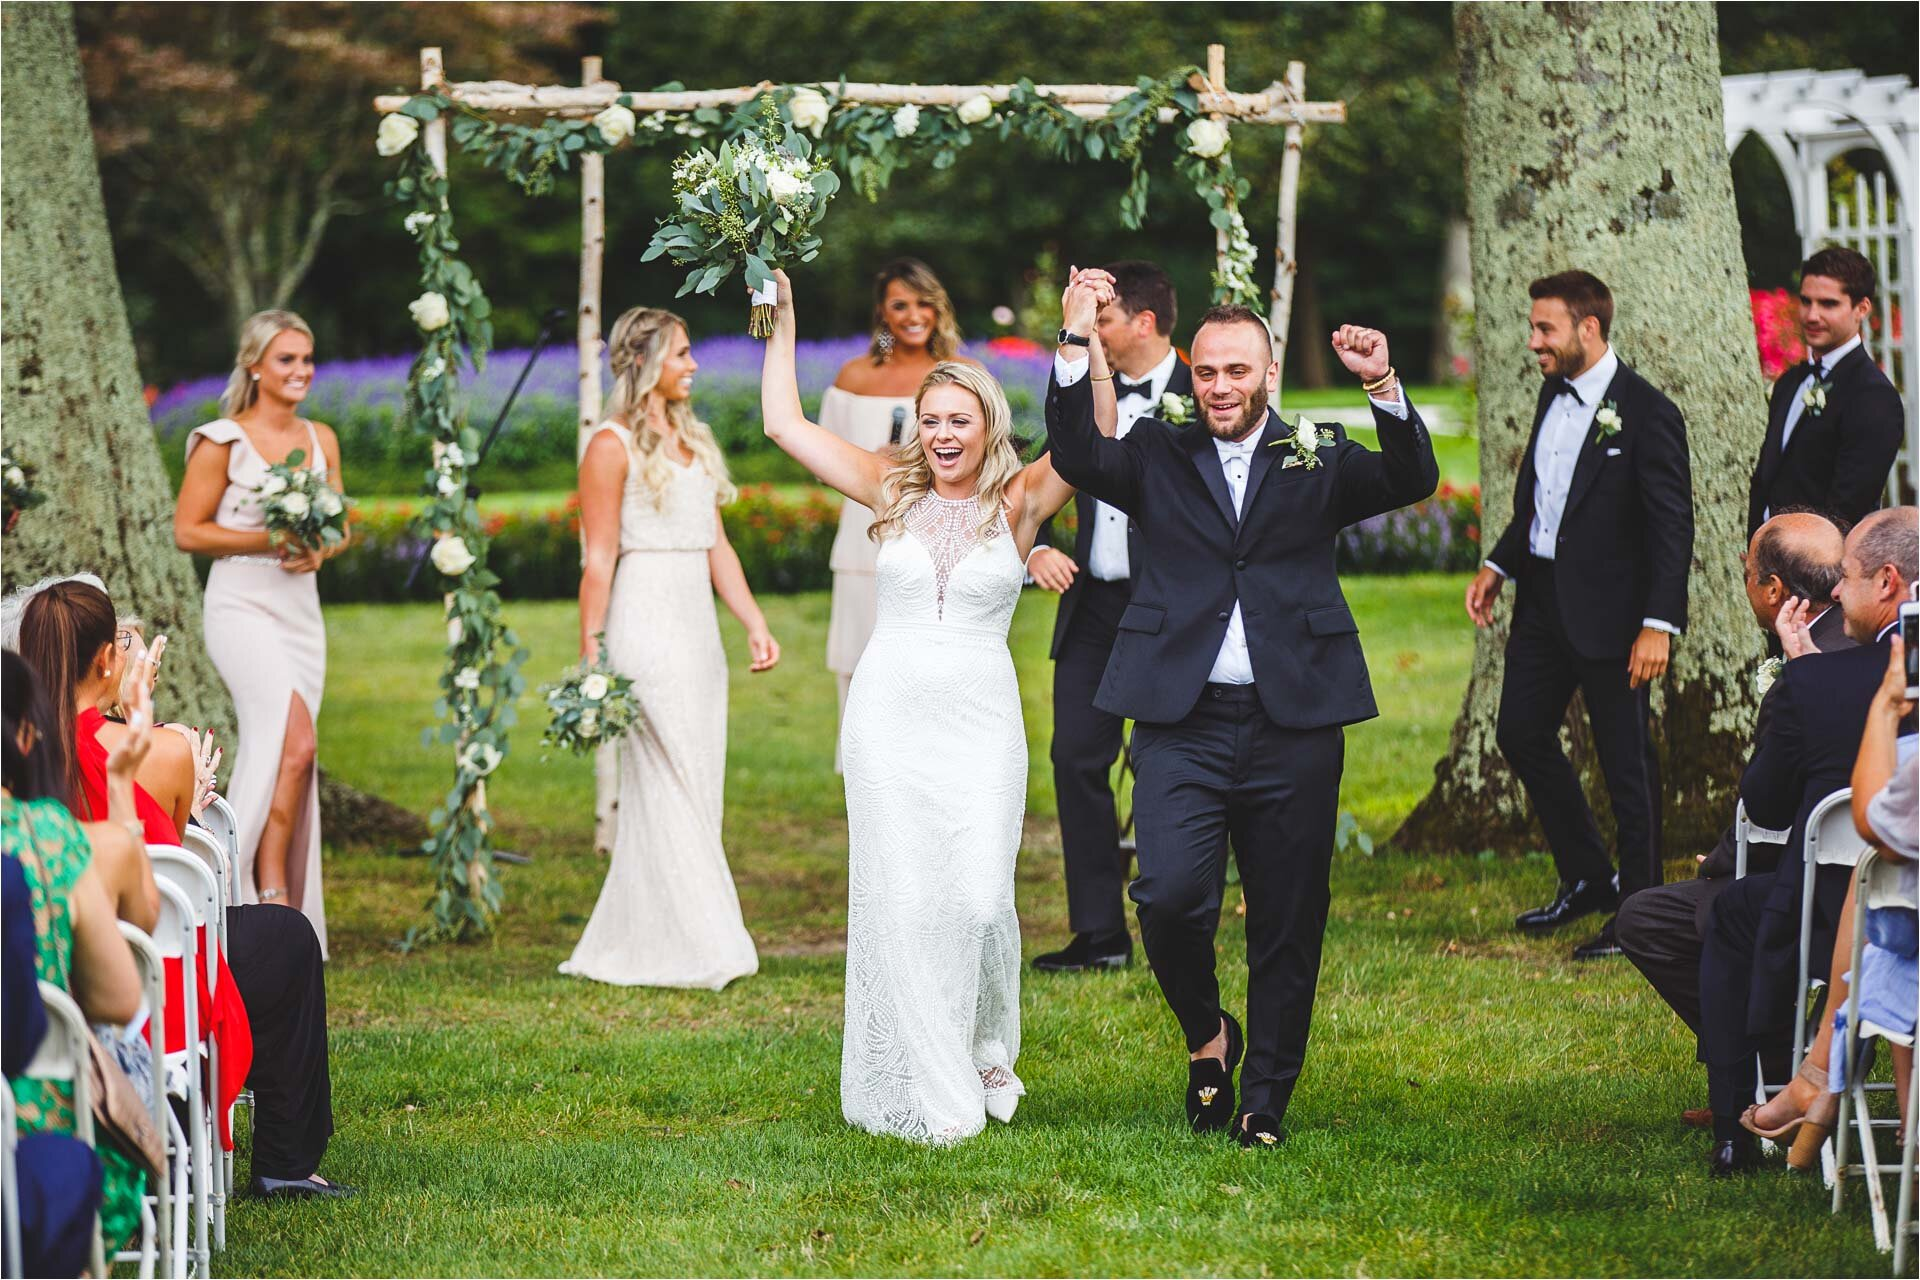 racebrook-countryclub-wedding-photography-17.jpg